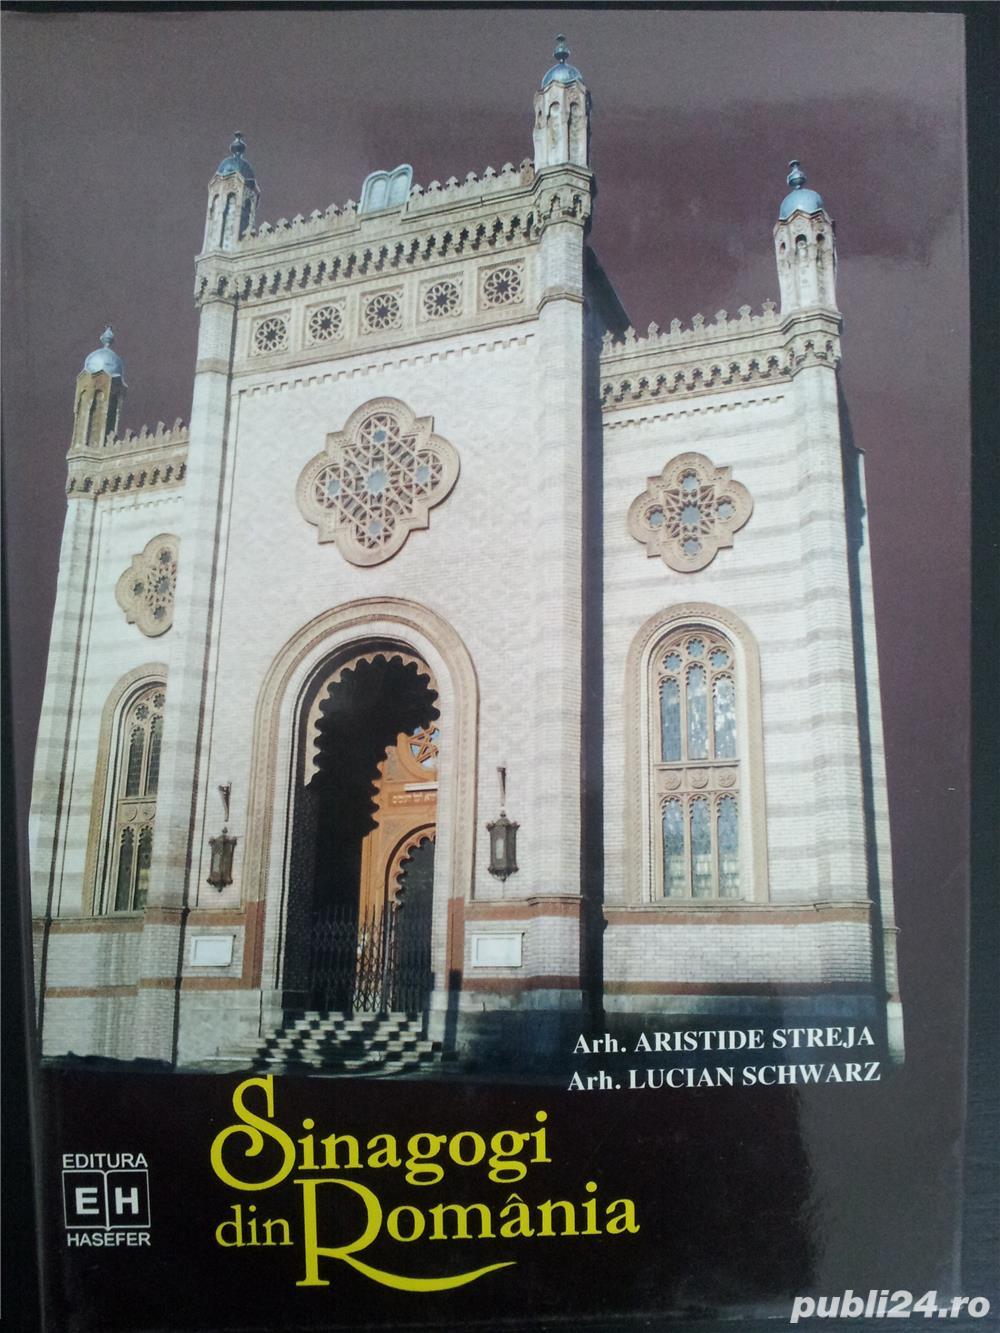 Sinagogi din Romania.(Aristide Streja, Lucian Schwrtz).